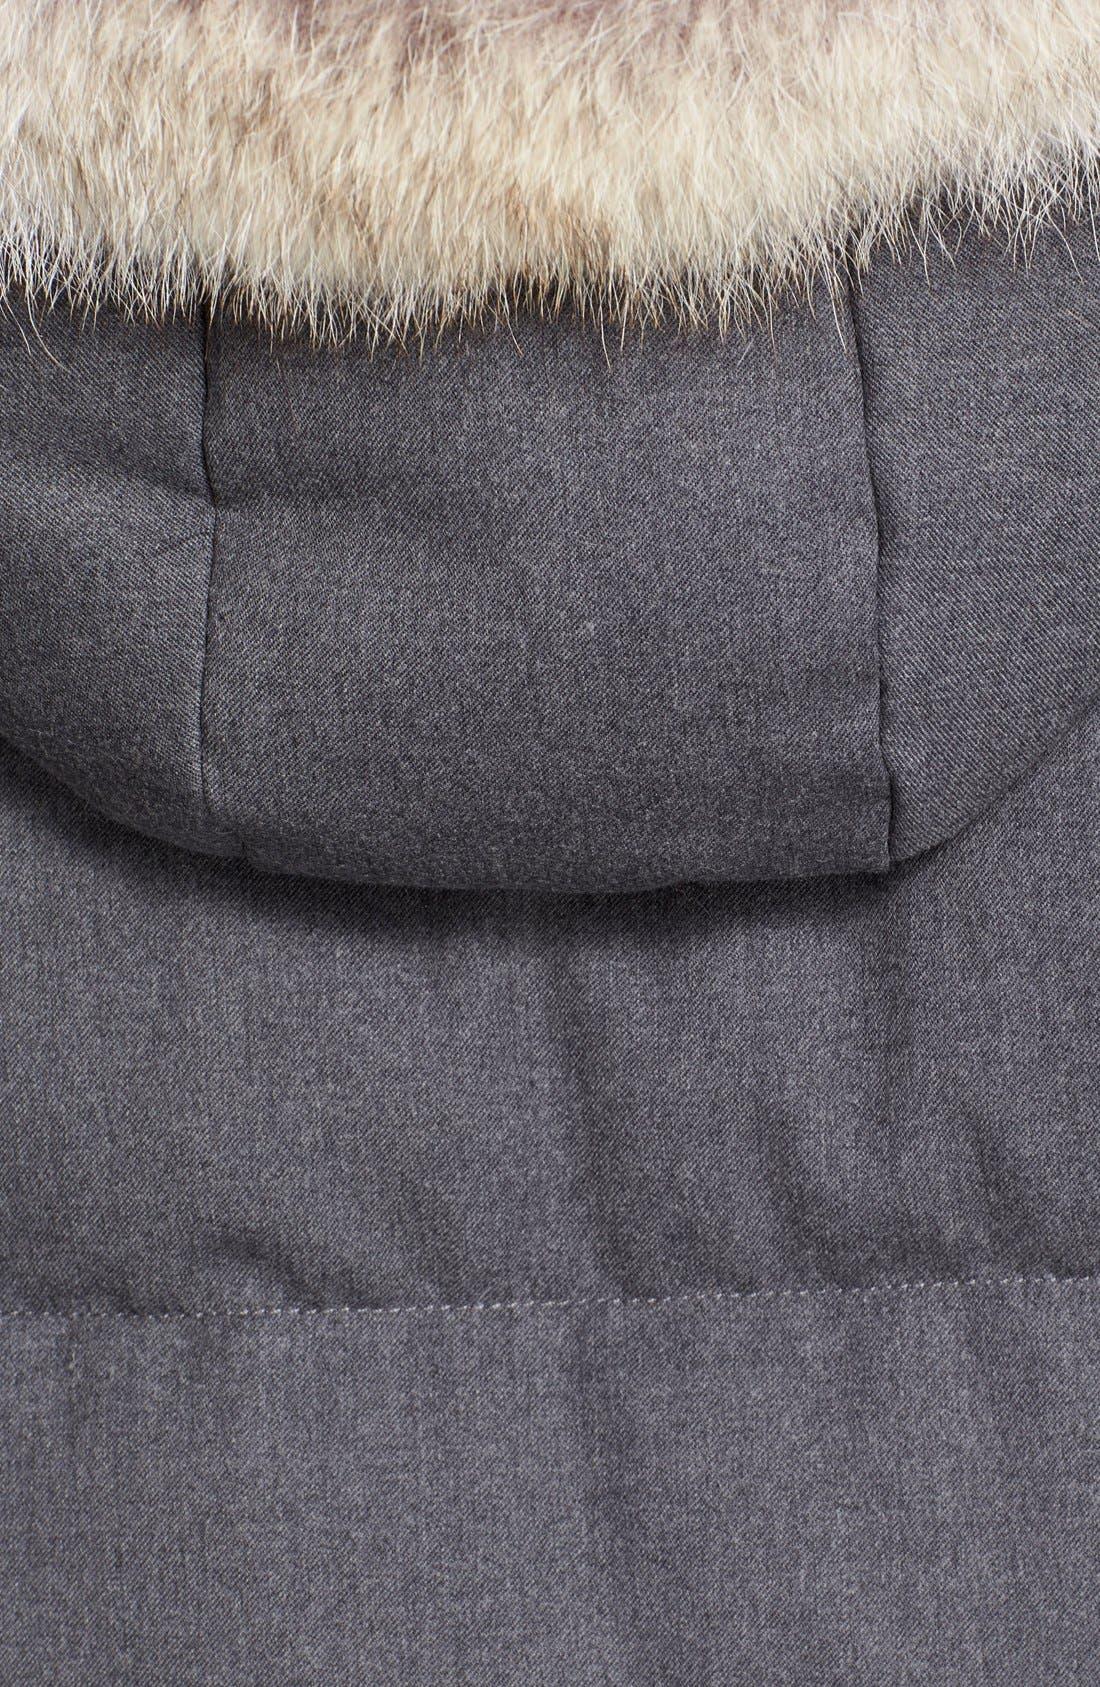 'Sasha' Puffer Jacket,                             Alternate thumbnail 3, color,                             028